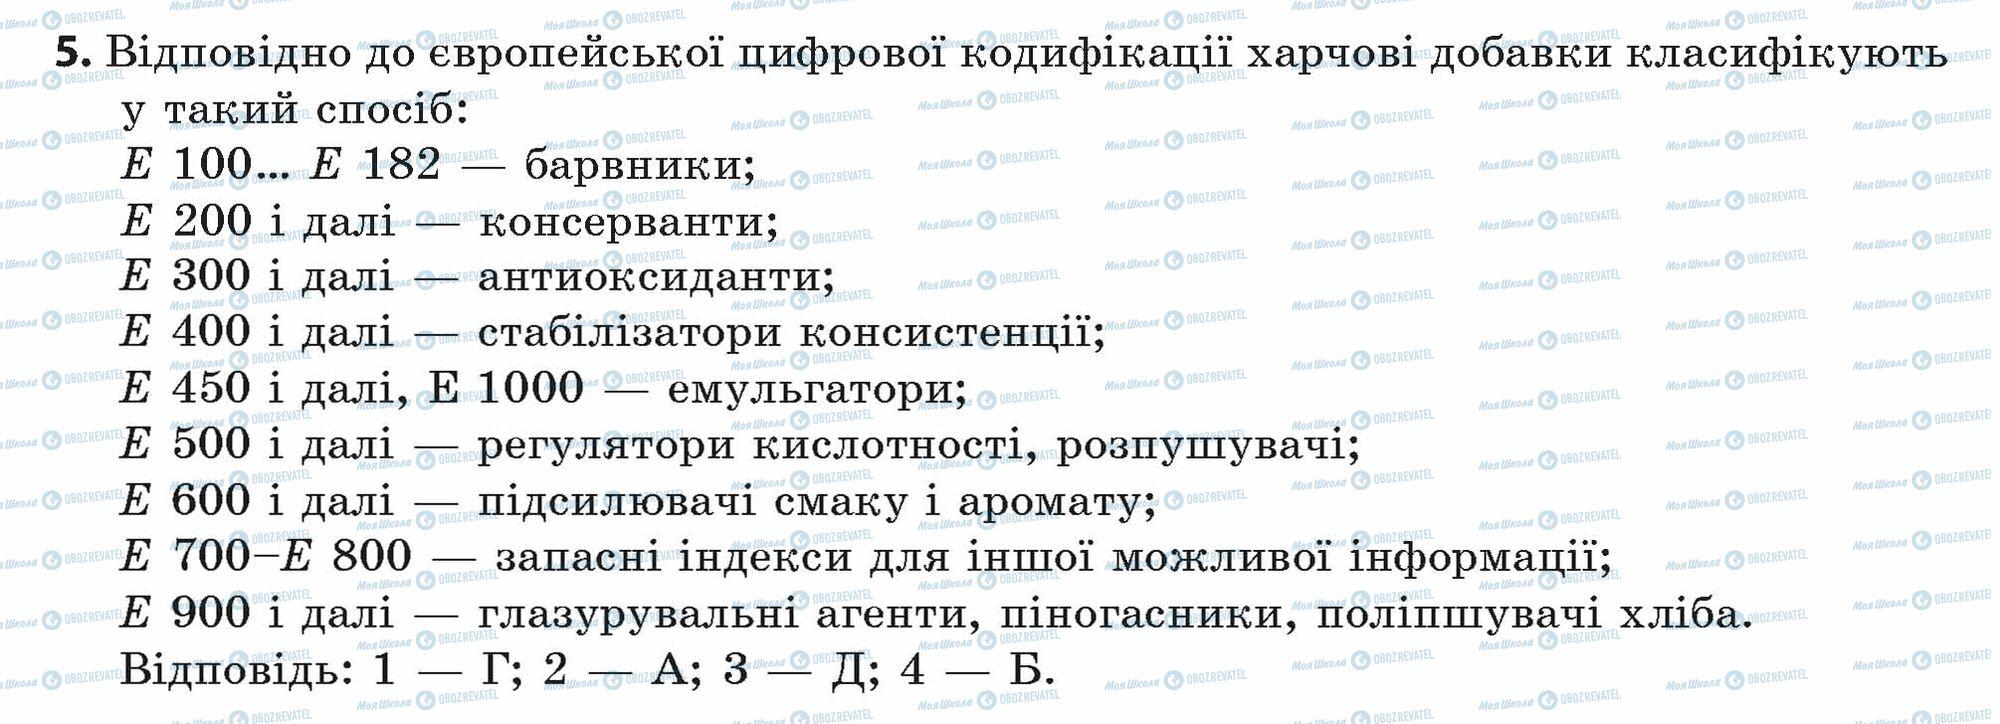 ГДЗ Химия 11 класс страница 5